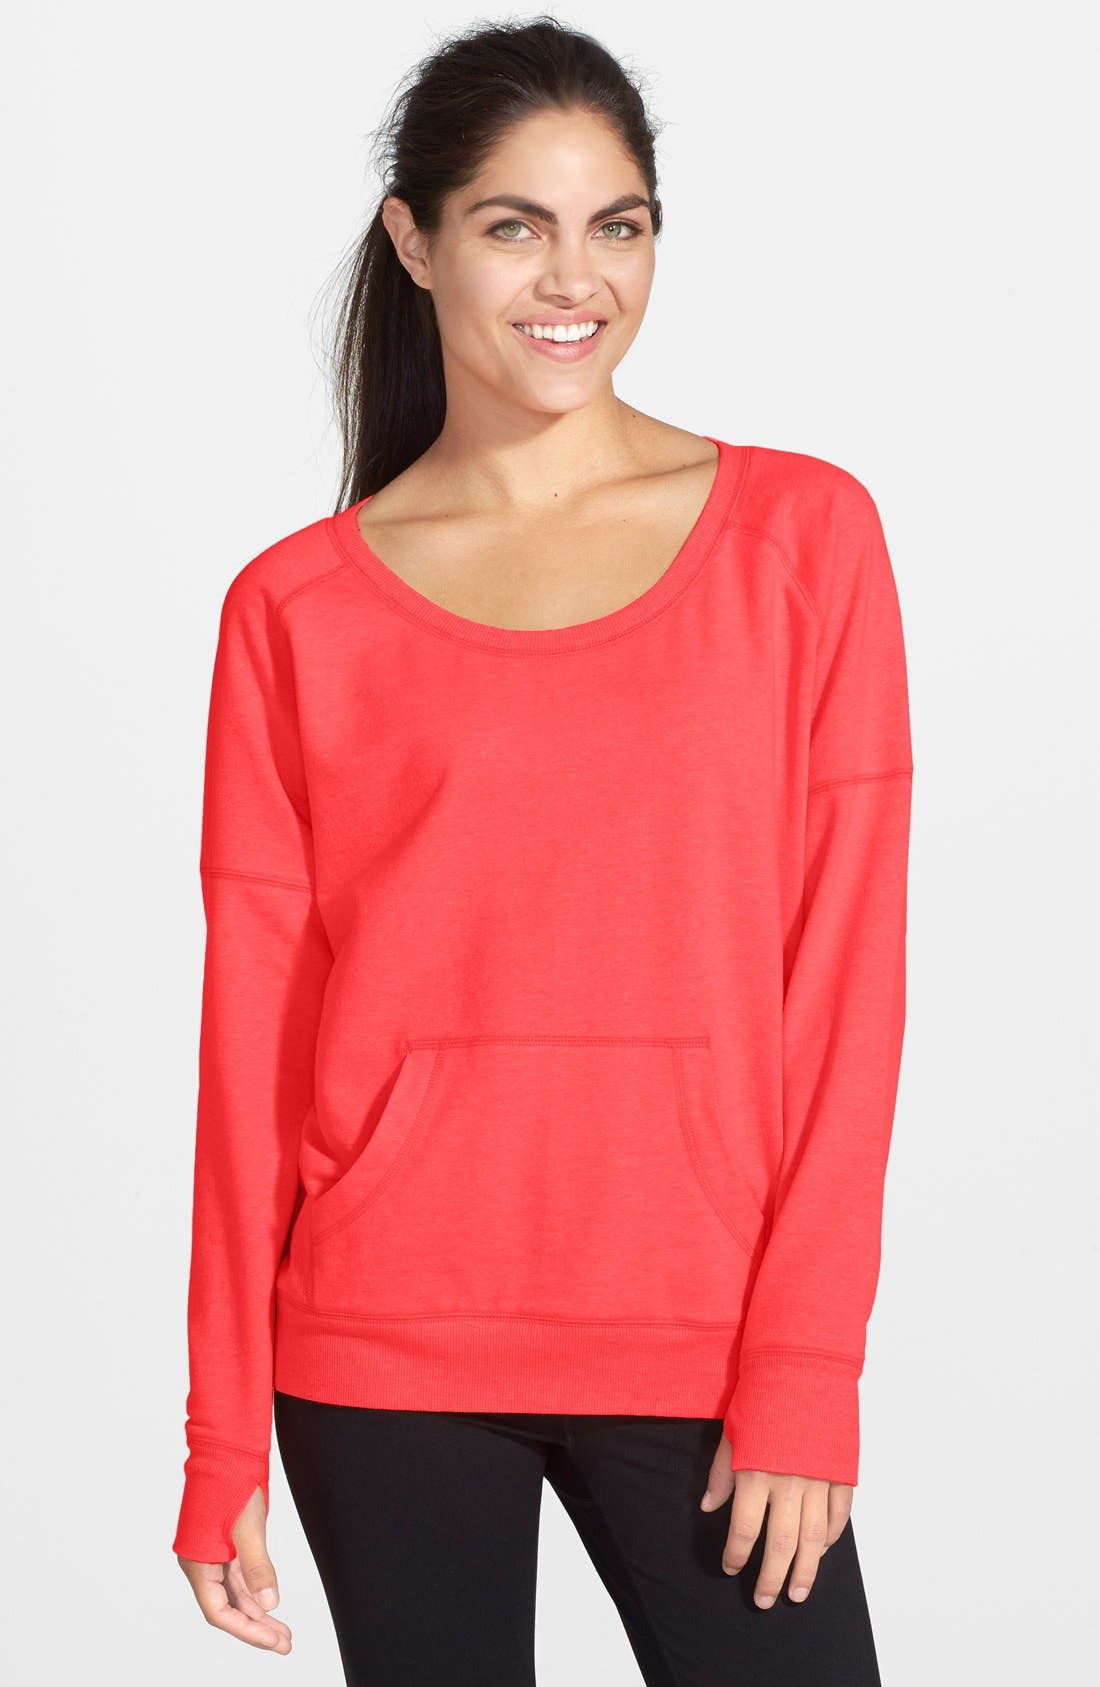 Main Image - Zella 'Heart It' French Terry Sweatshirt